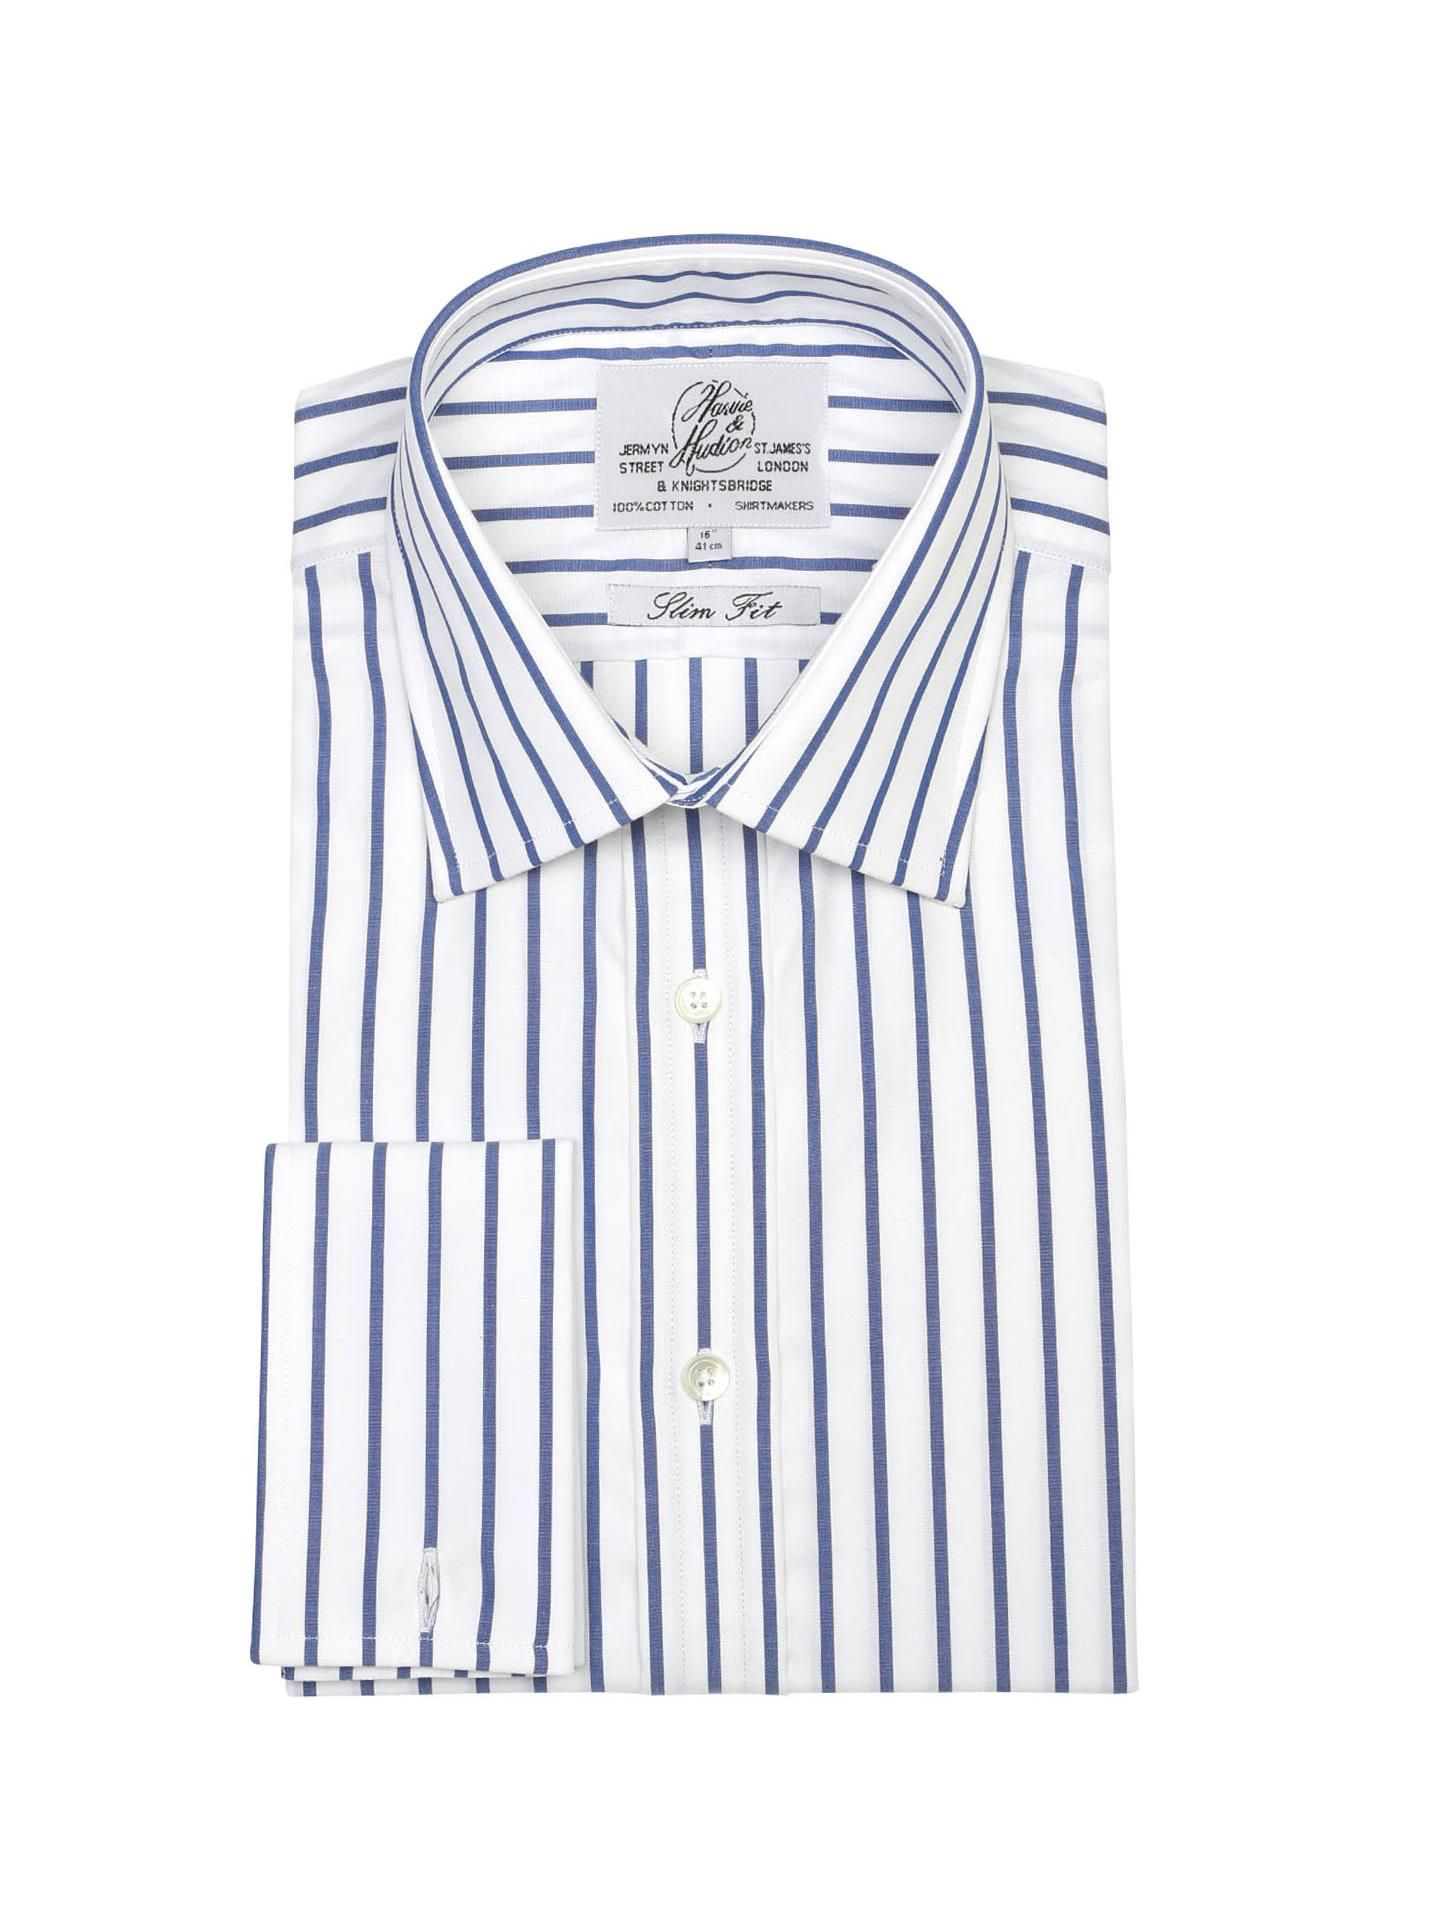 aa9a23c9a4f Мужская рубашка под запонки белая в синюю полоску Harvie   Hudson  приталенная Slim Fit